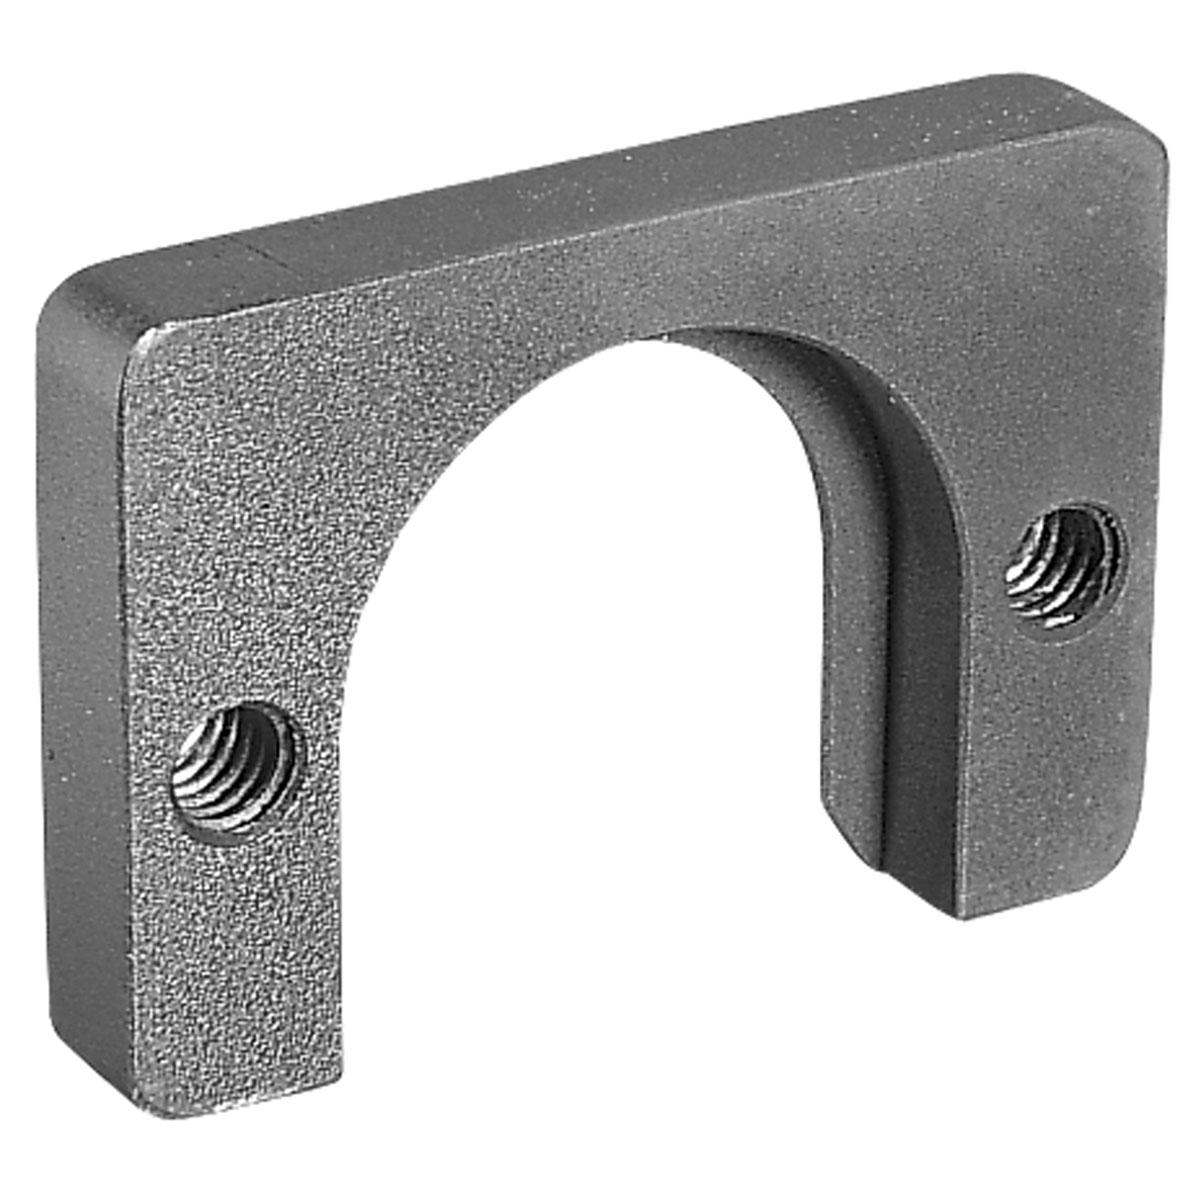 Hotop Designs Neck Bearing Tool